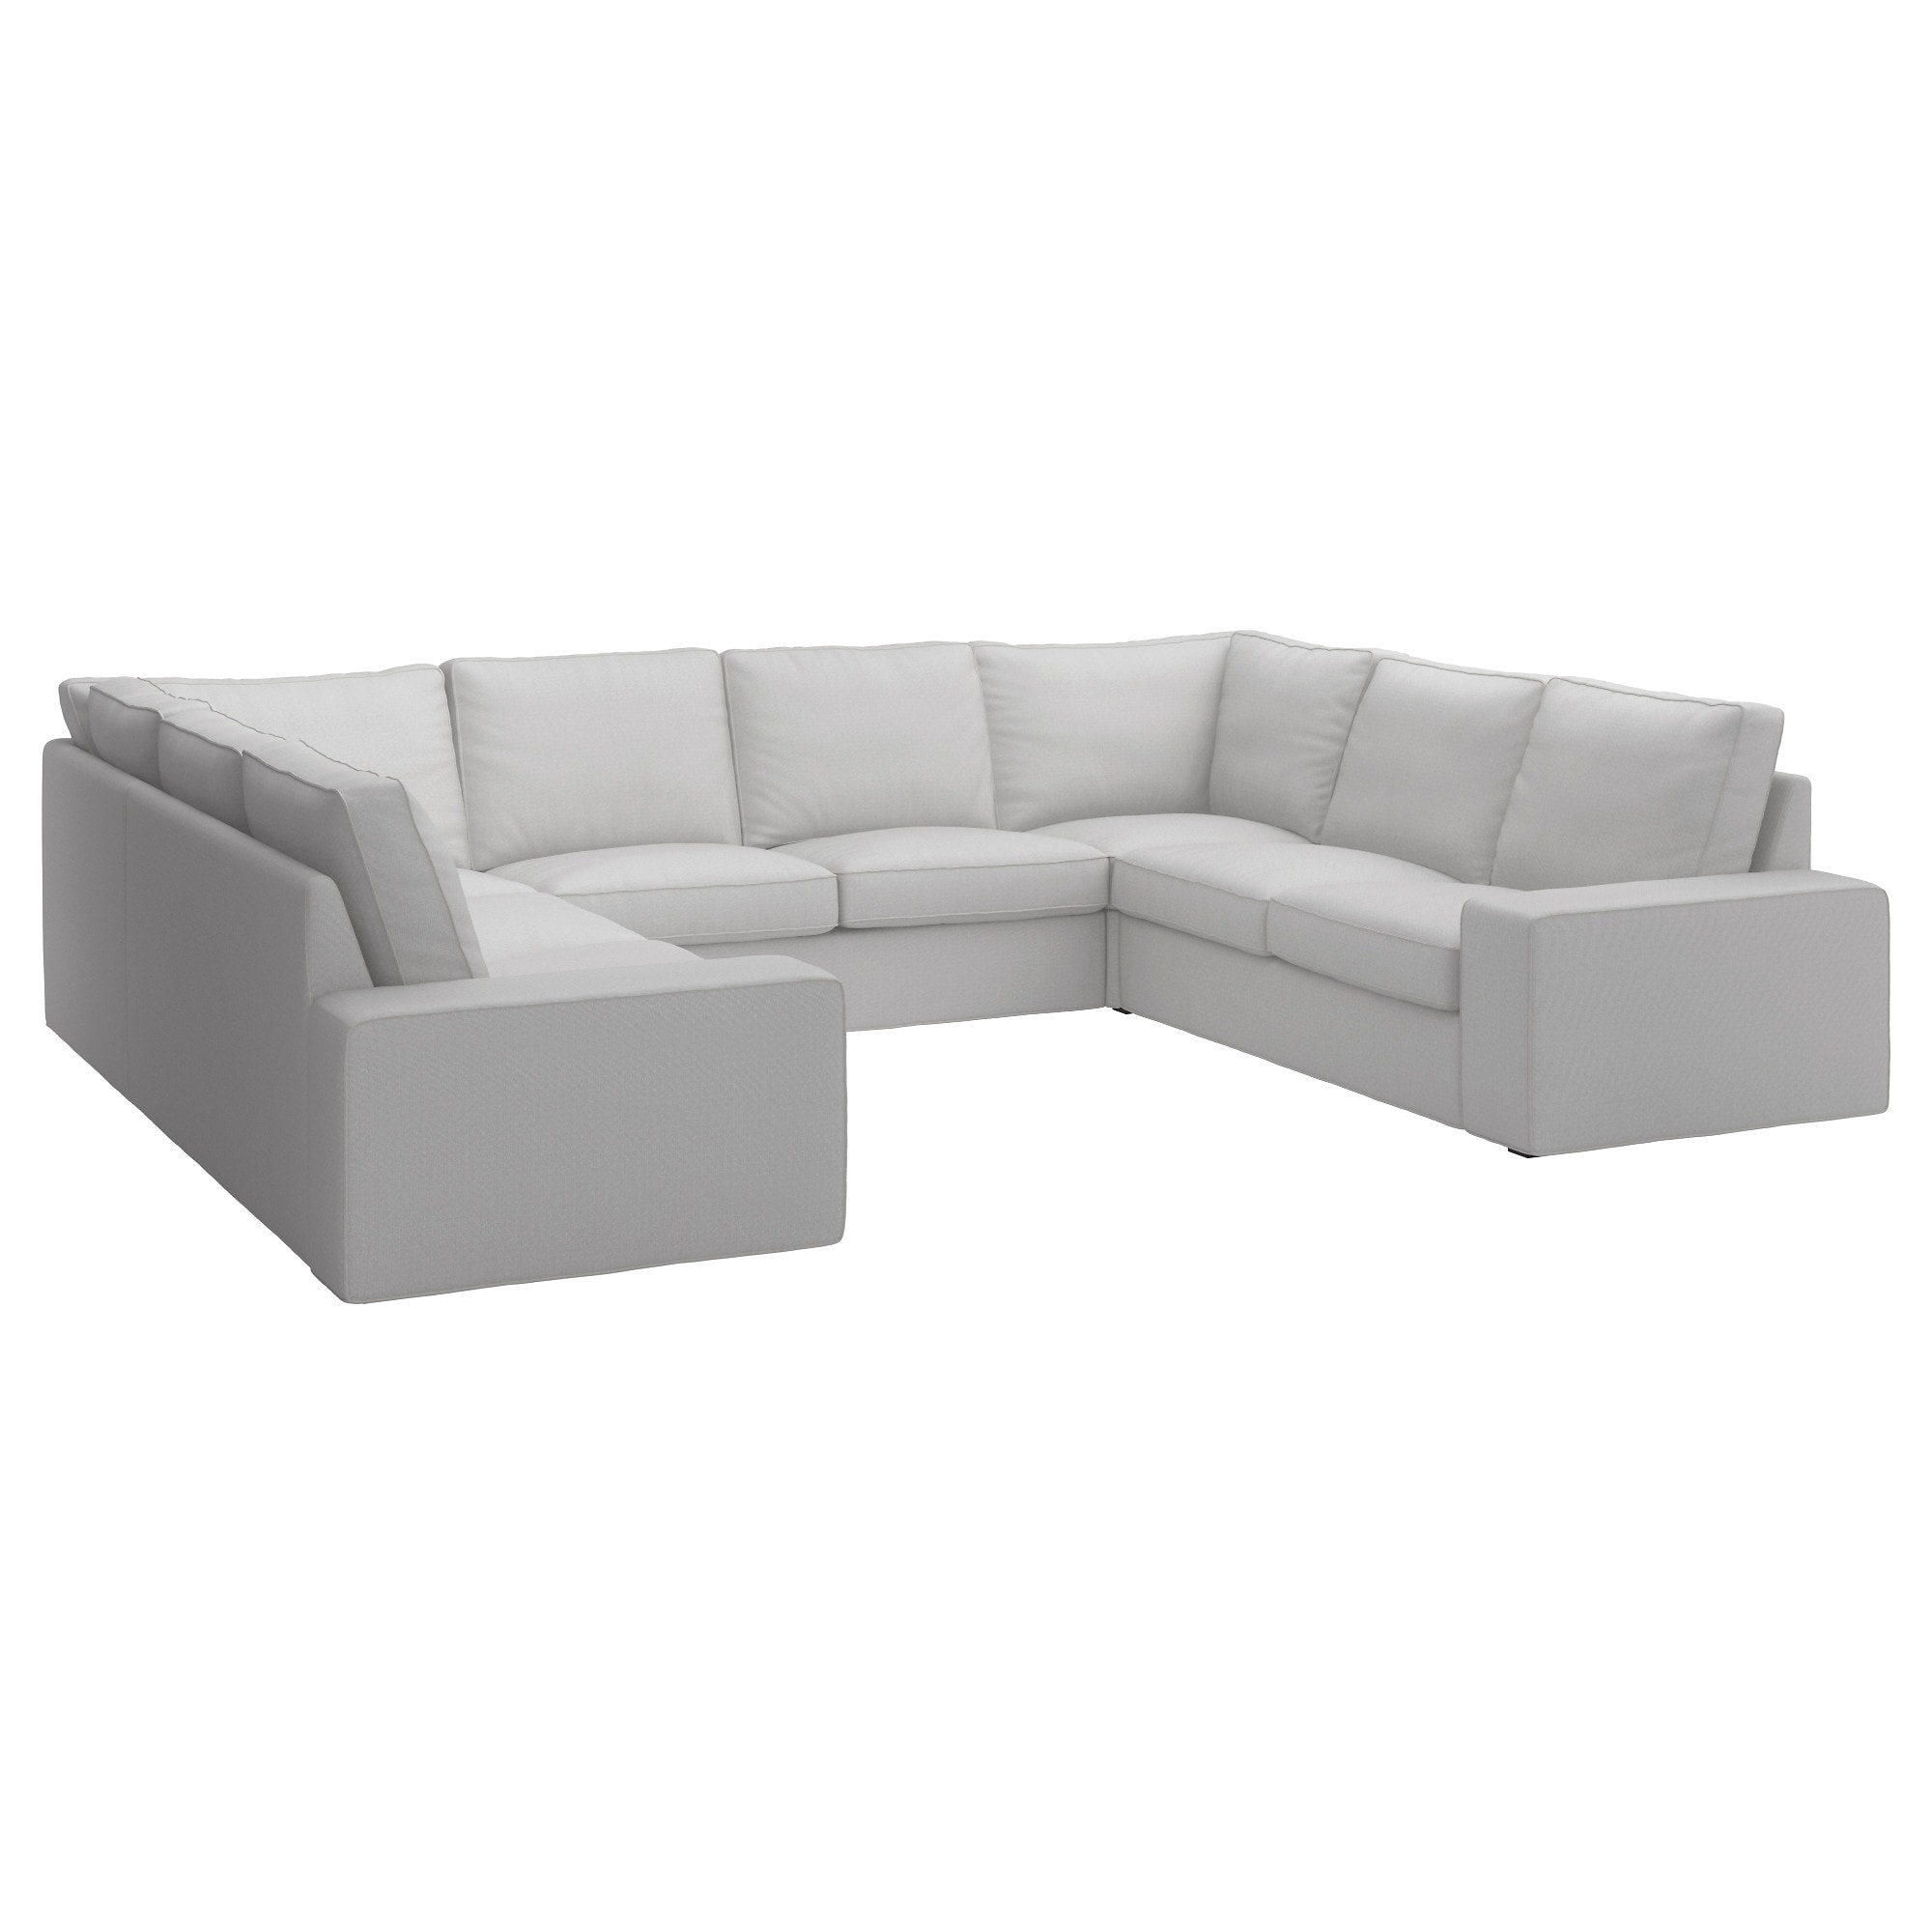 Sofas En U Whdr Kivik sofà 6 Plazas En U orrsta Gris Claro Ikea